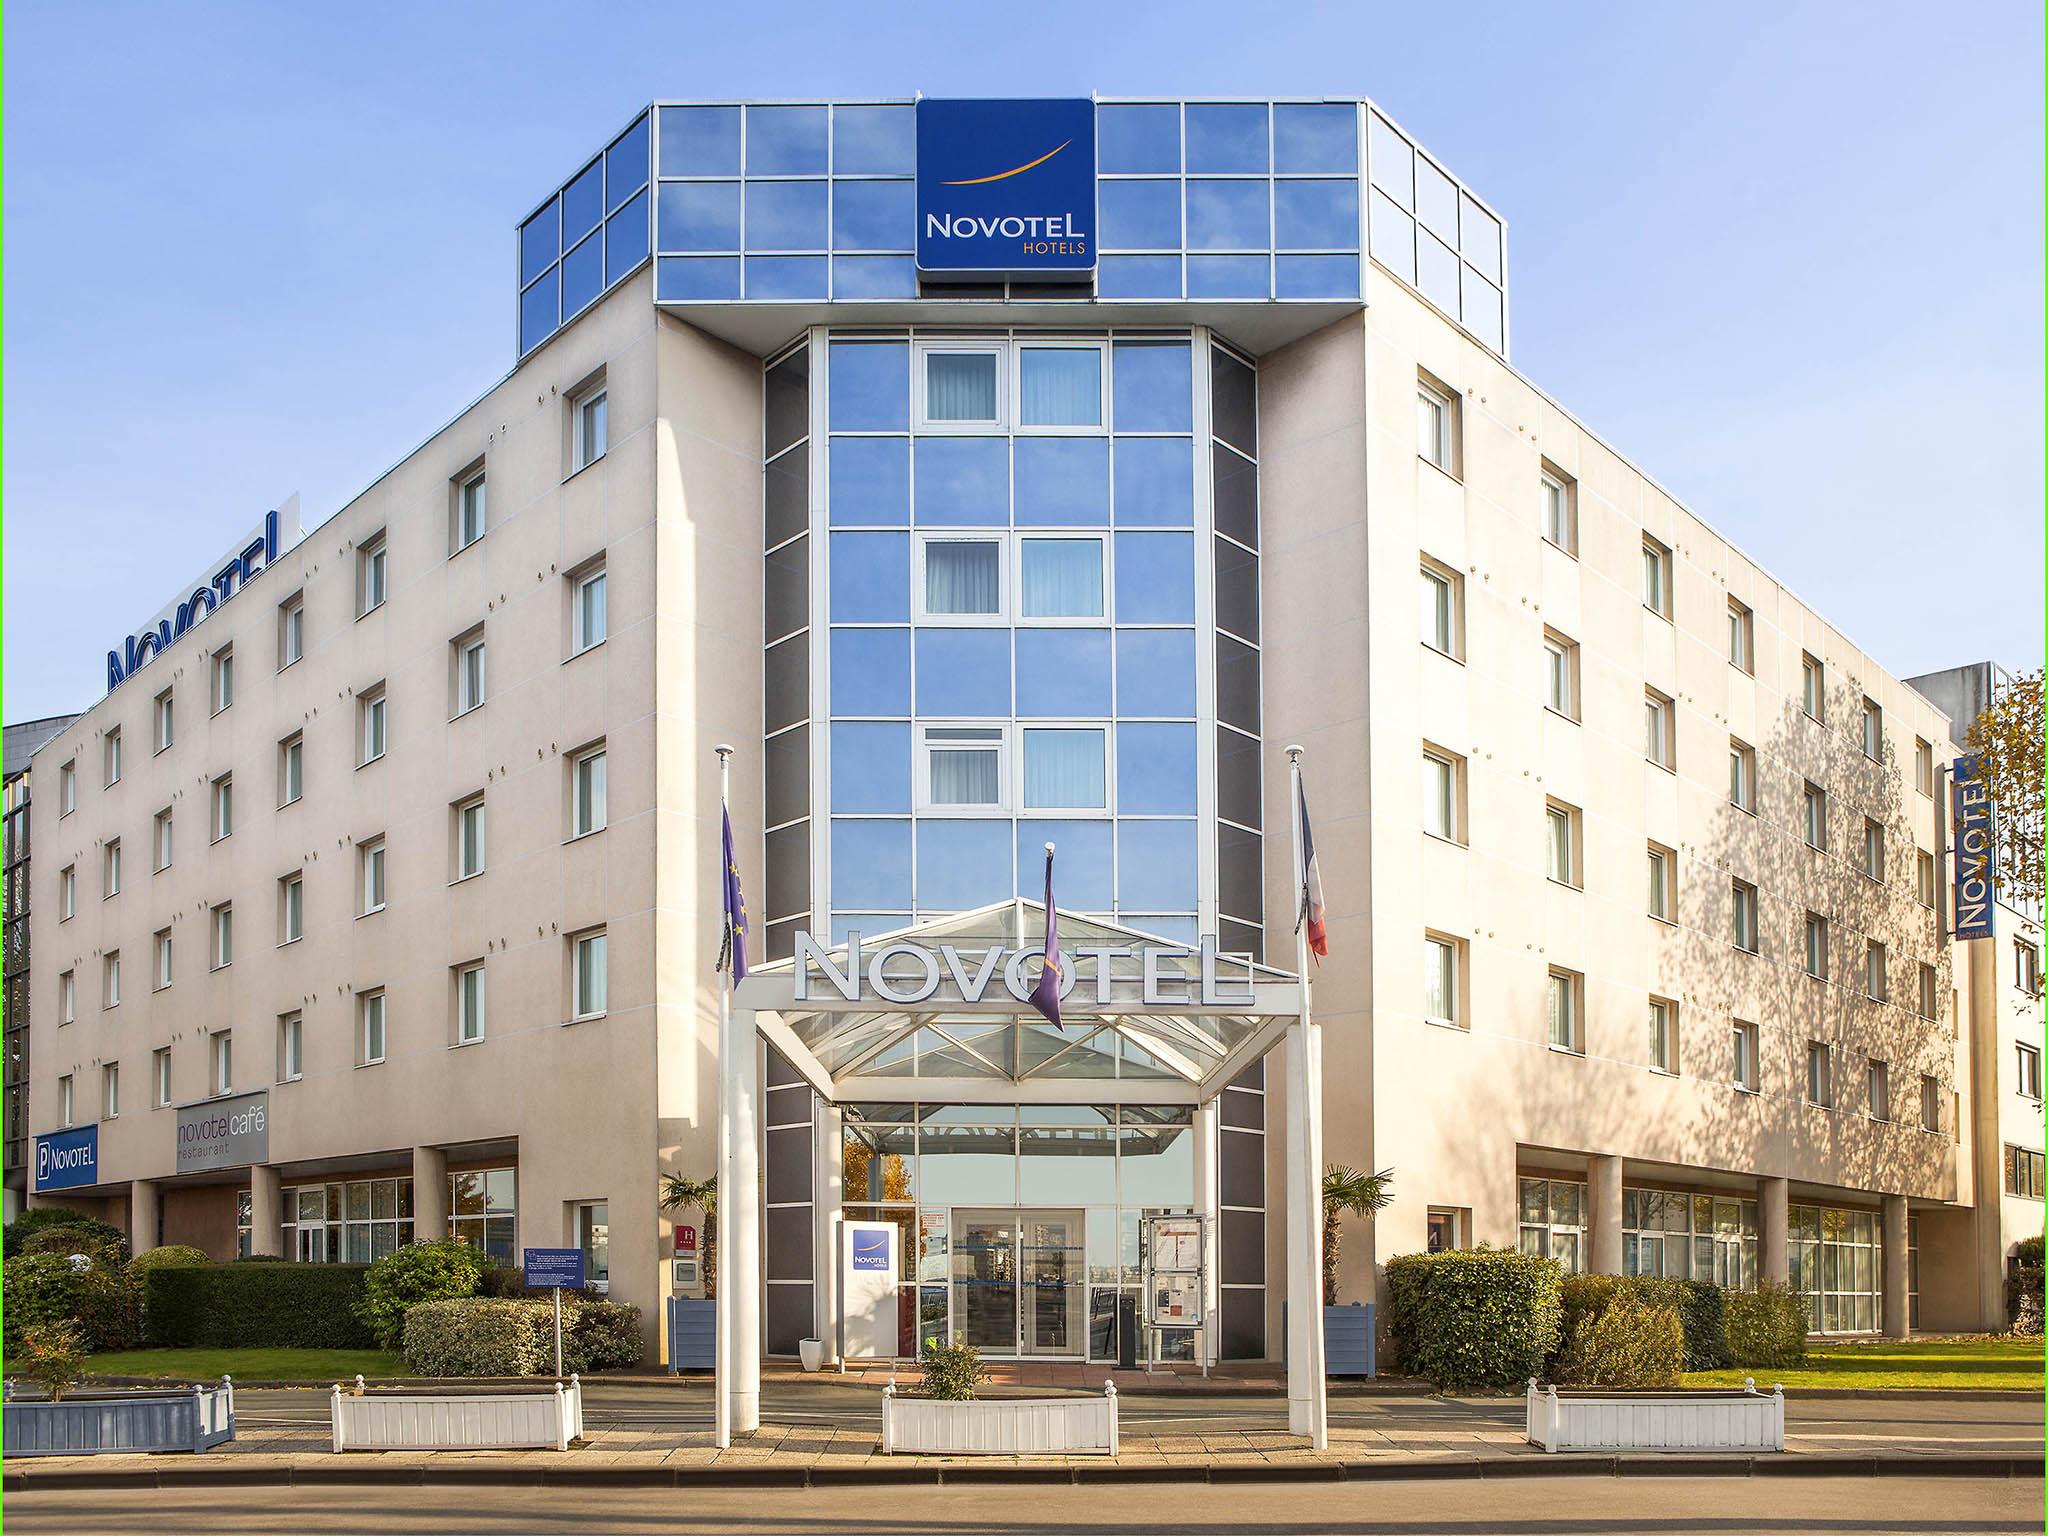 Hotel - Novotel Nantes Centre Bord de Loire